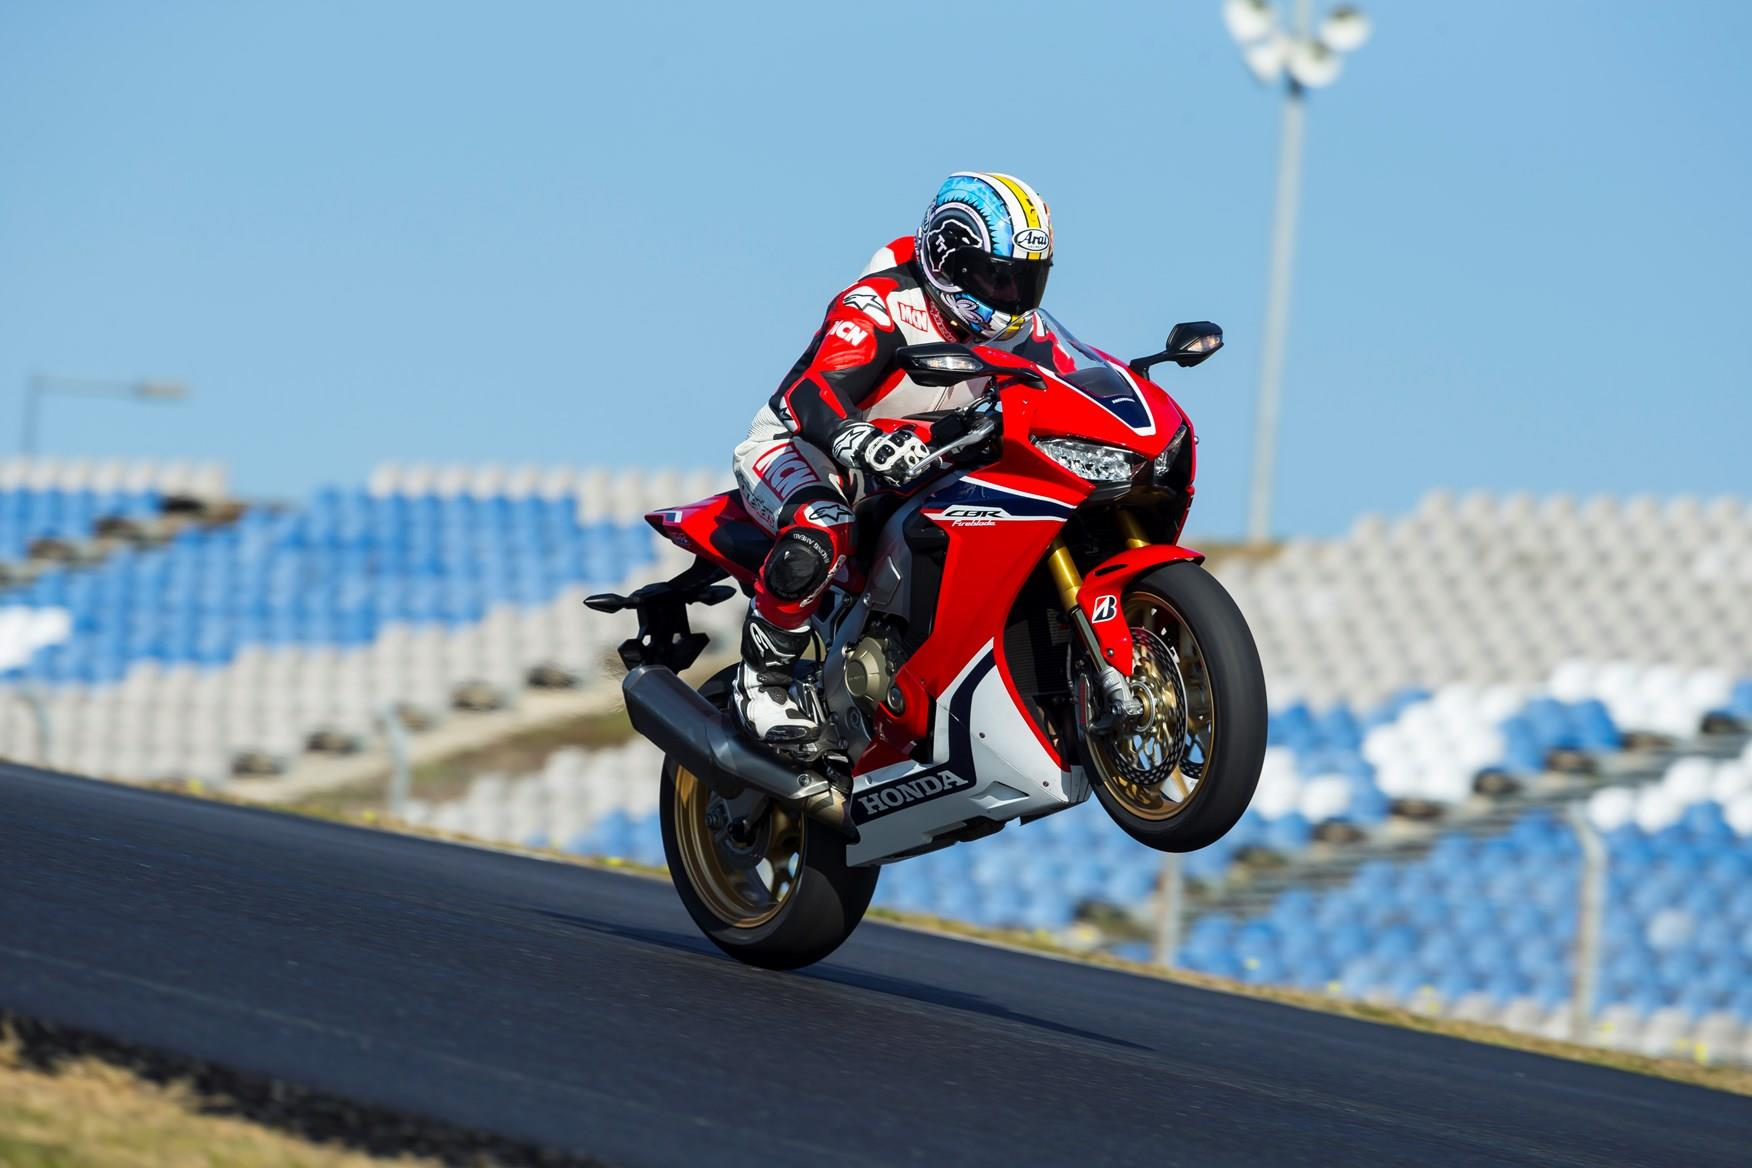 Ducati  Sp For Sale In India